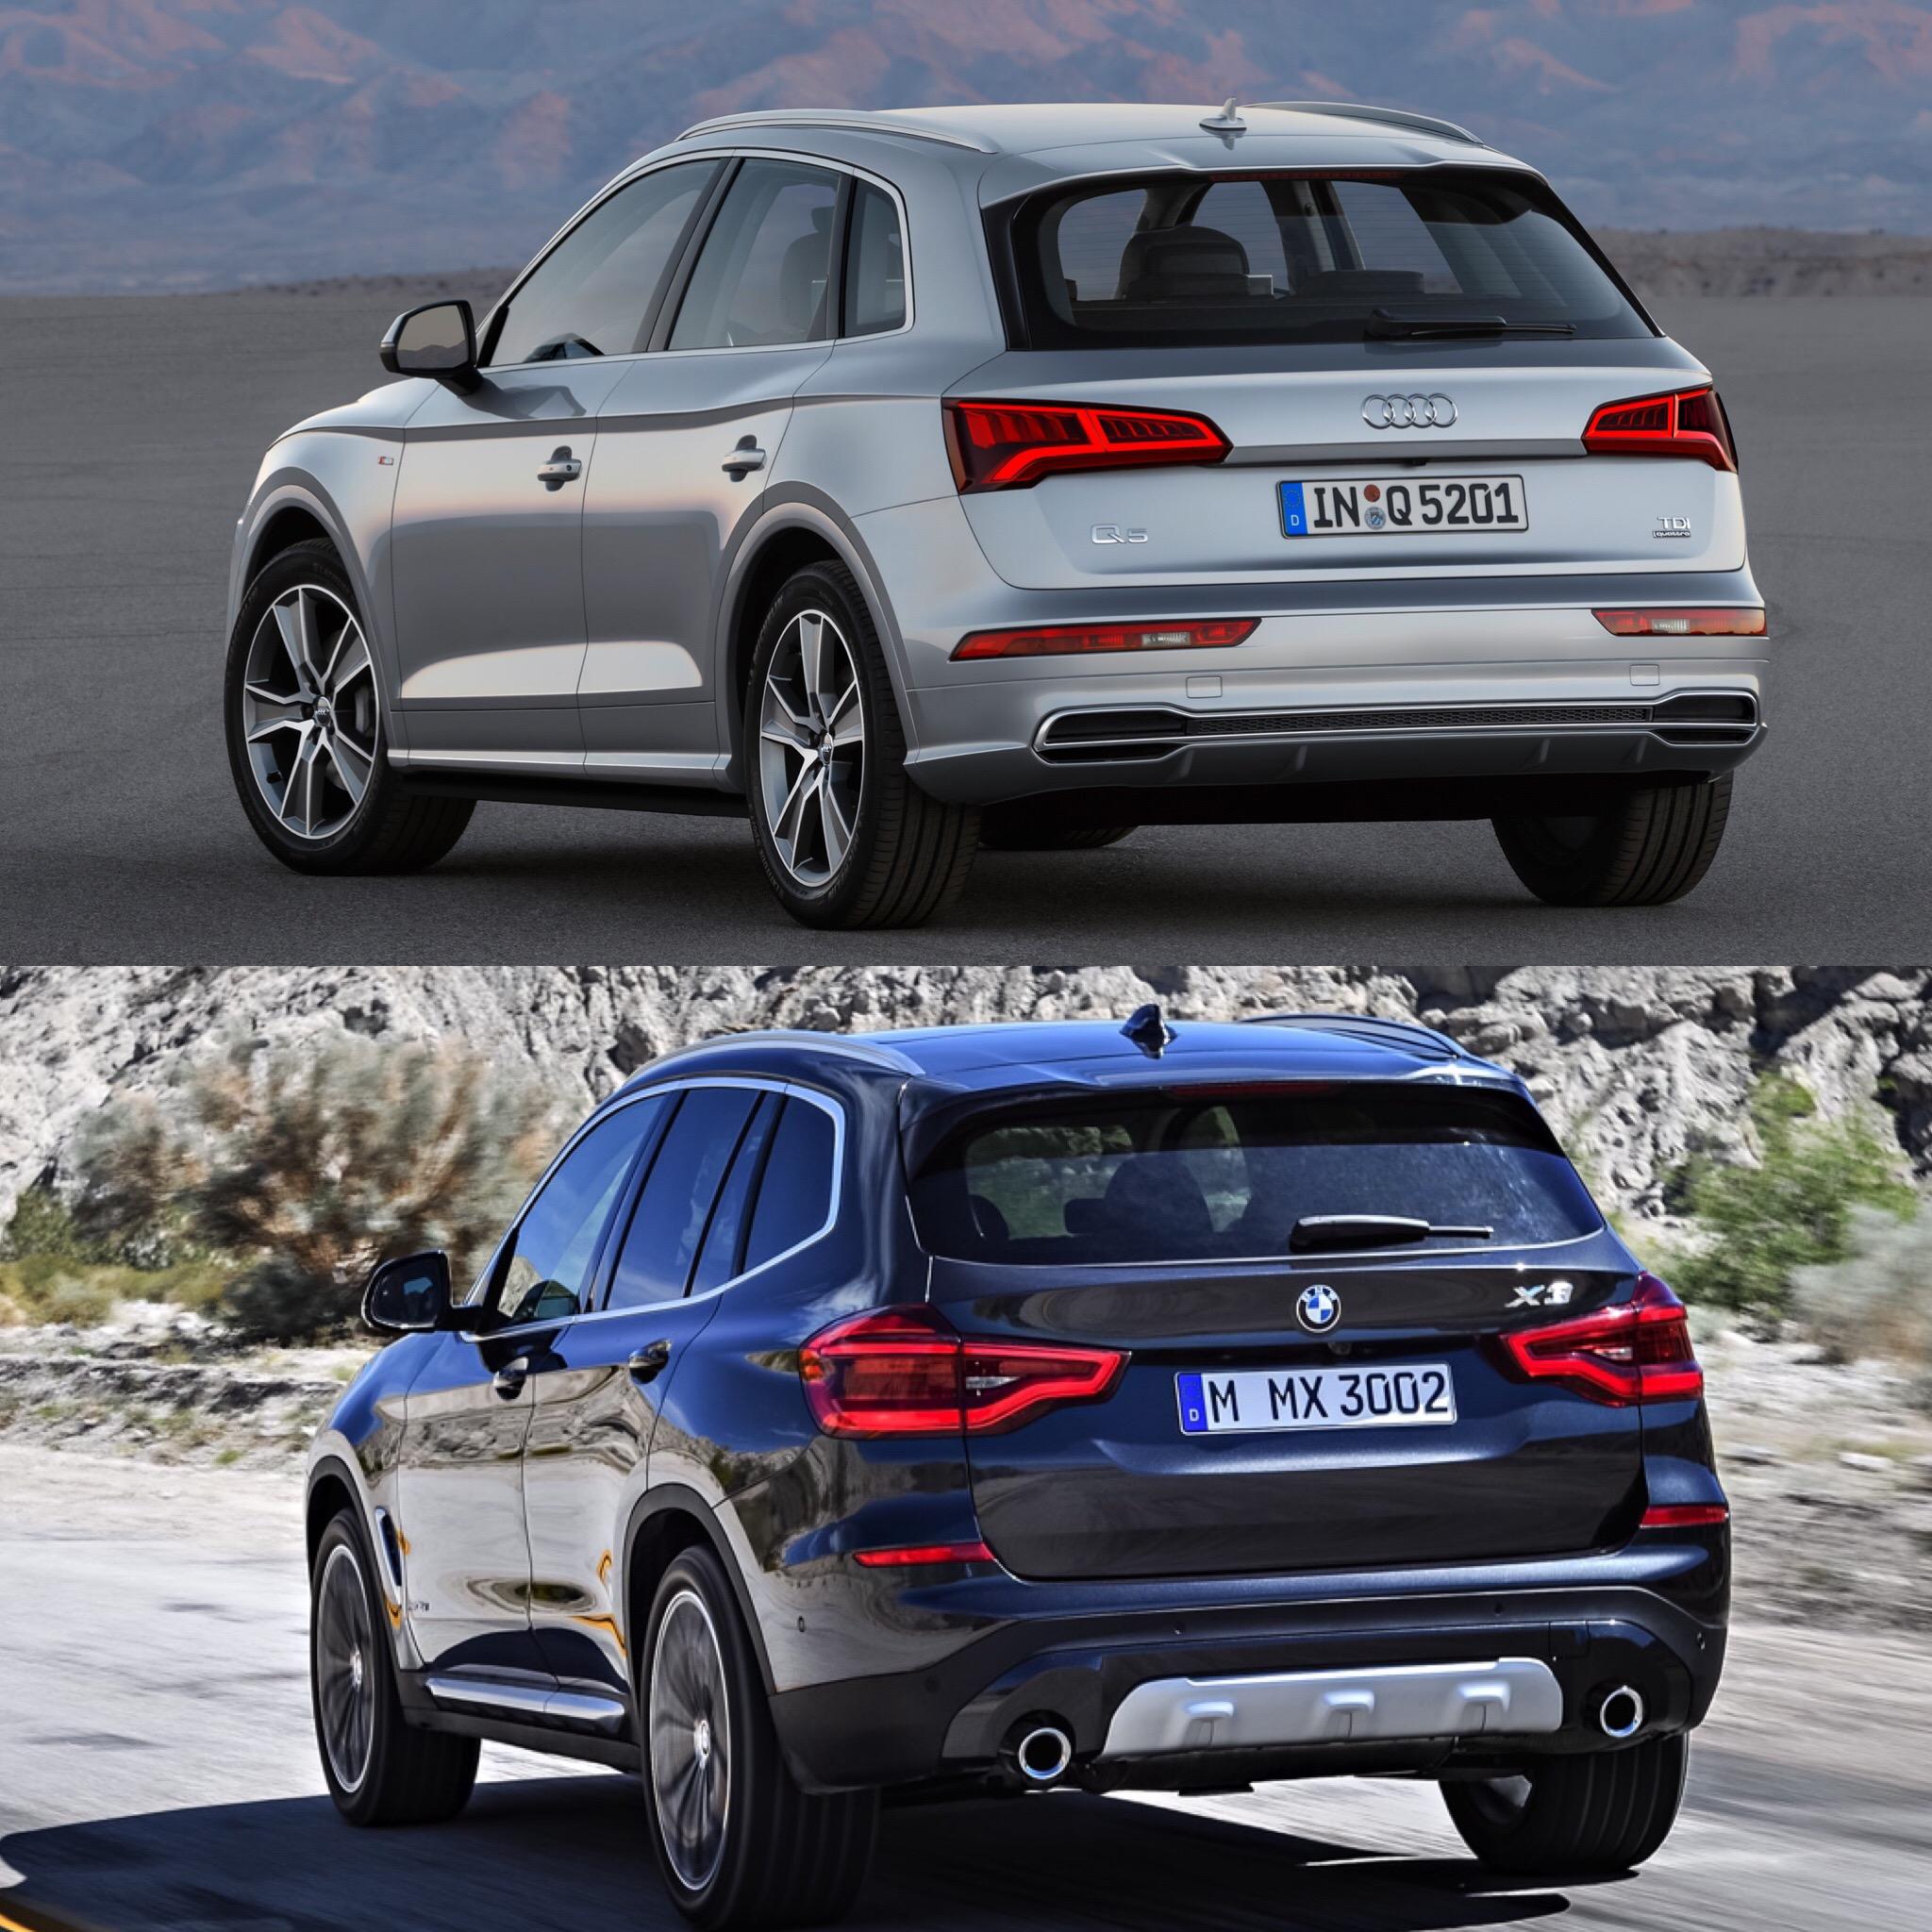 Photo Comparison: G01 BMW X3 xDrive30ivs Audi Q5 2.0T